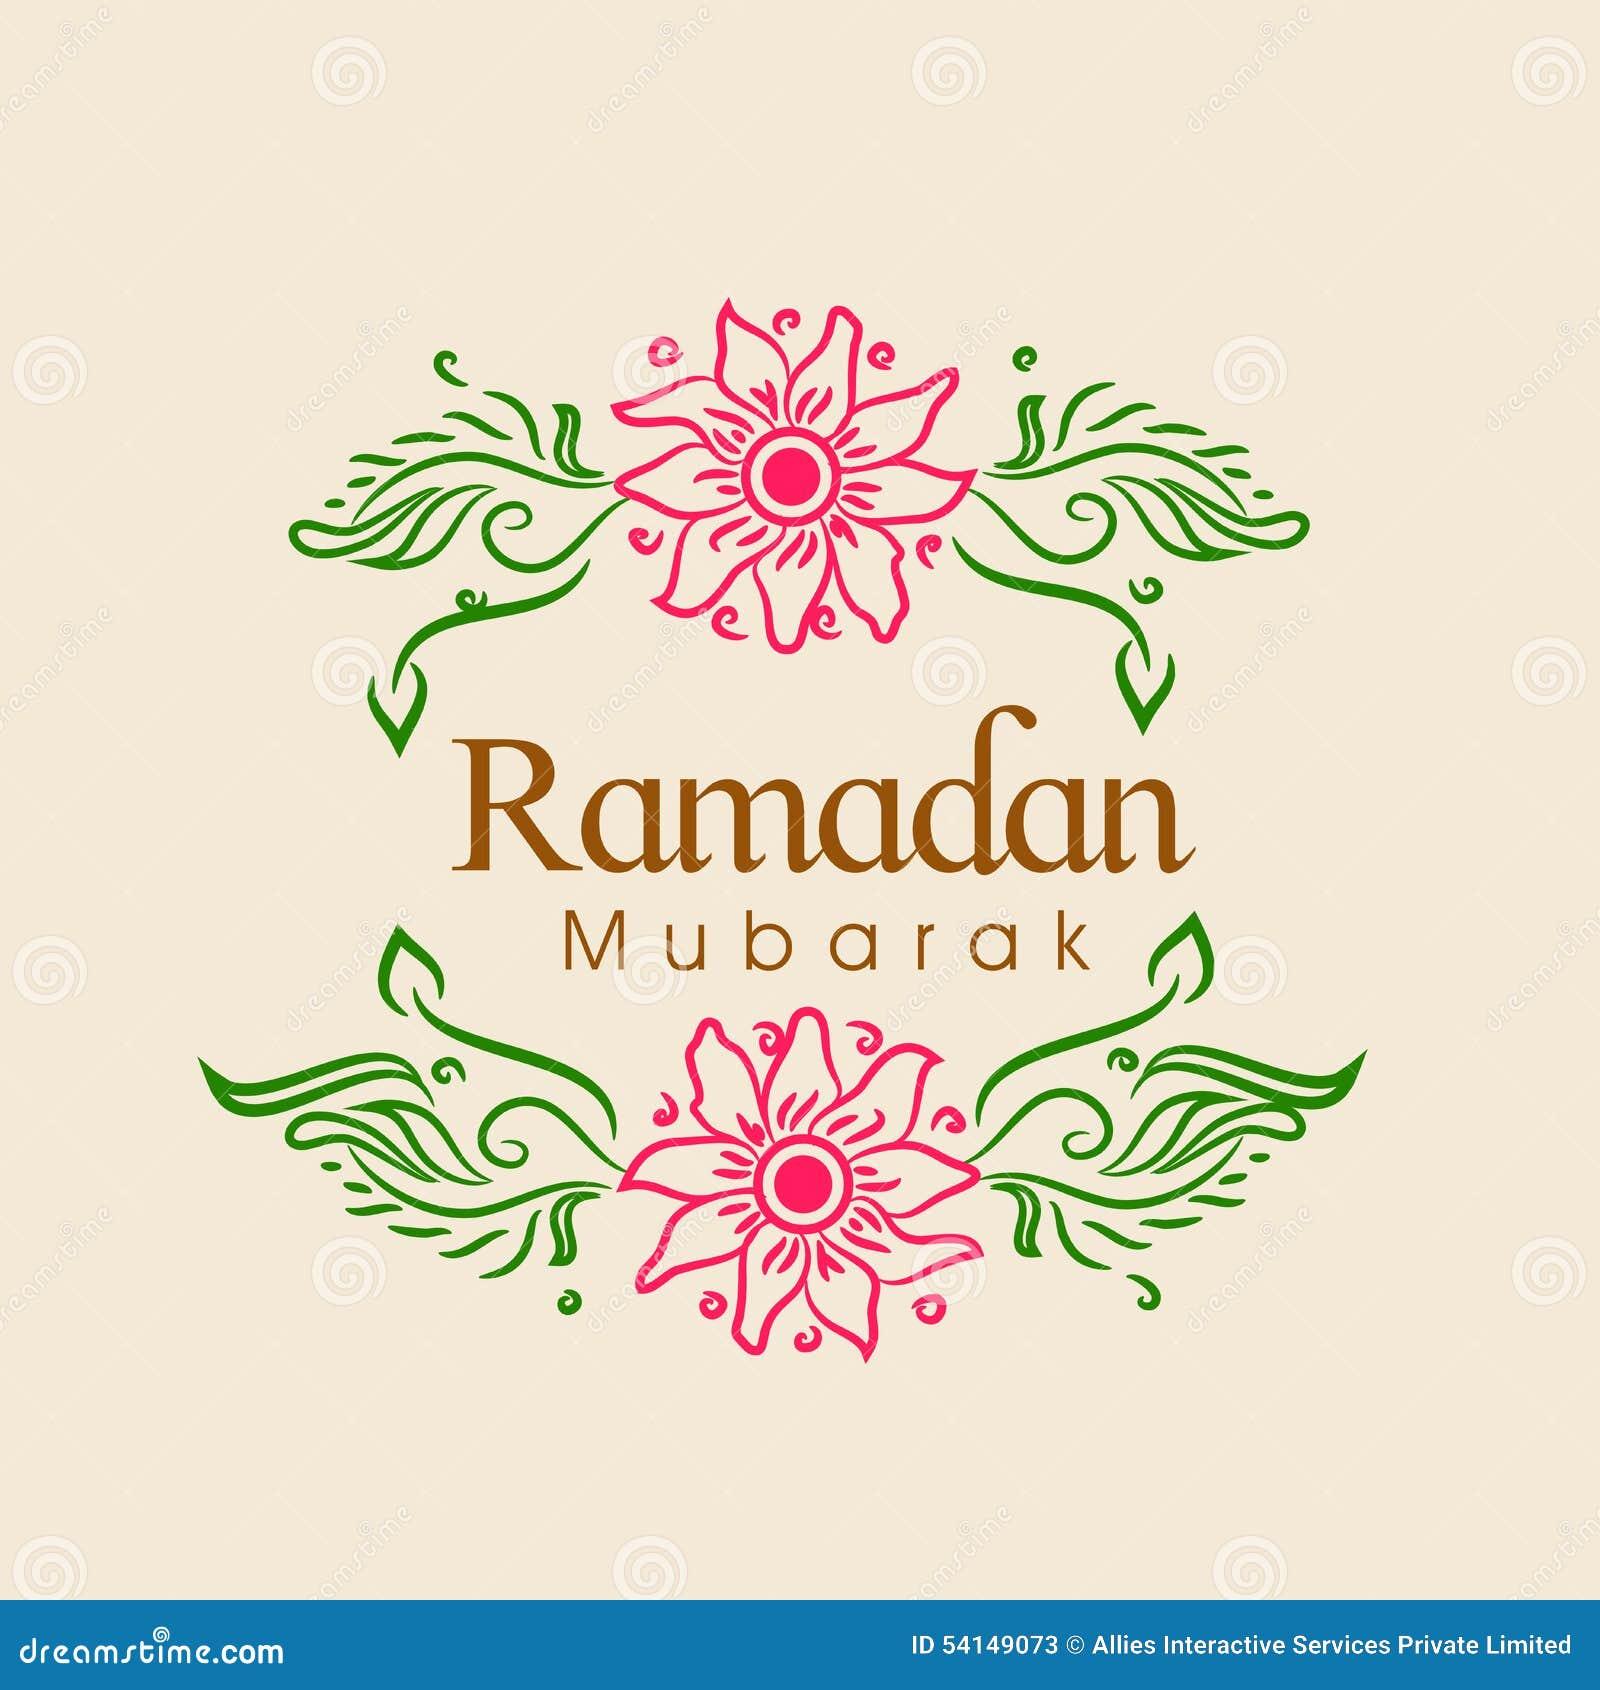 Greeting Card Design For Ramadan Kareem Celebration Illustration